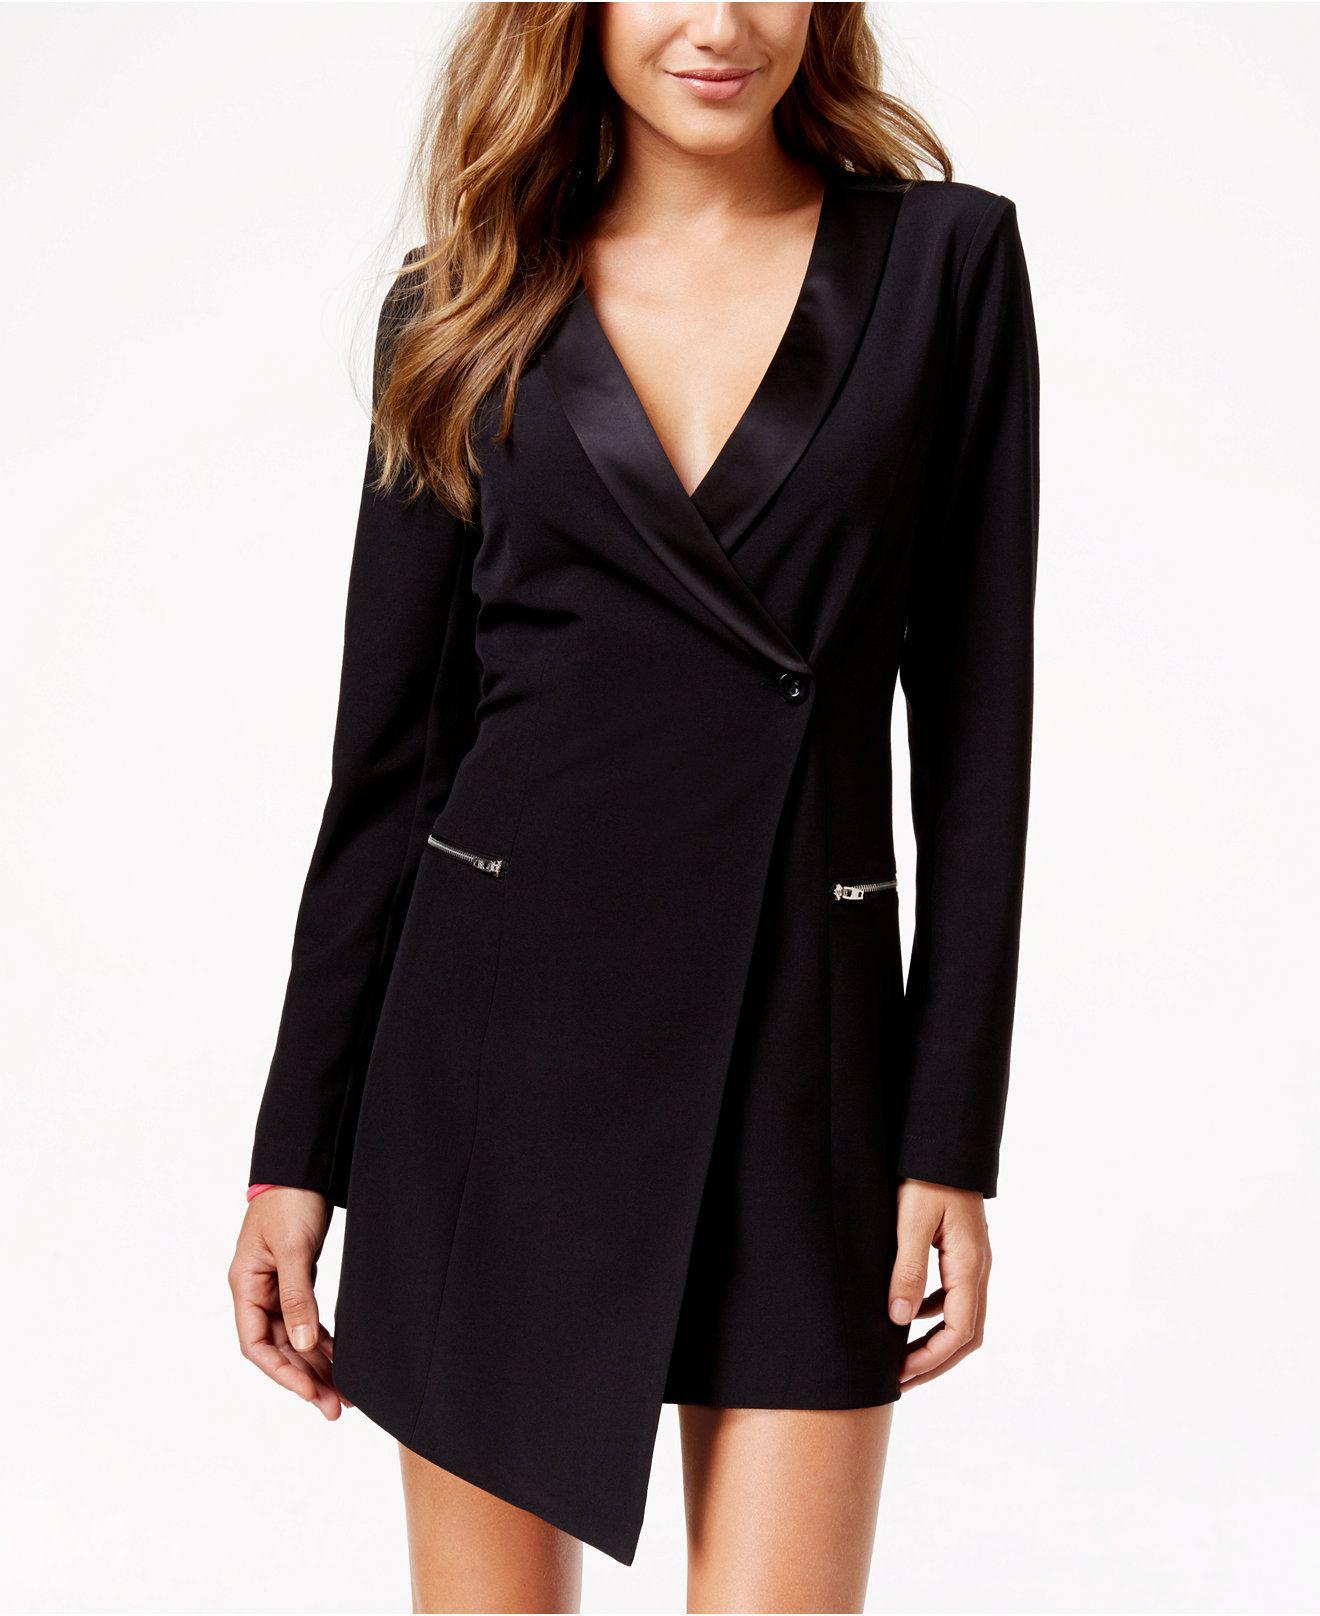 Material Girl Juniors Tuxedo Dress Teenage Dresses Browse Macy S Teenage Dress Posh Clothing Tuxedo Dress [ 1616 x 1320 Pixel ]